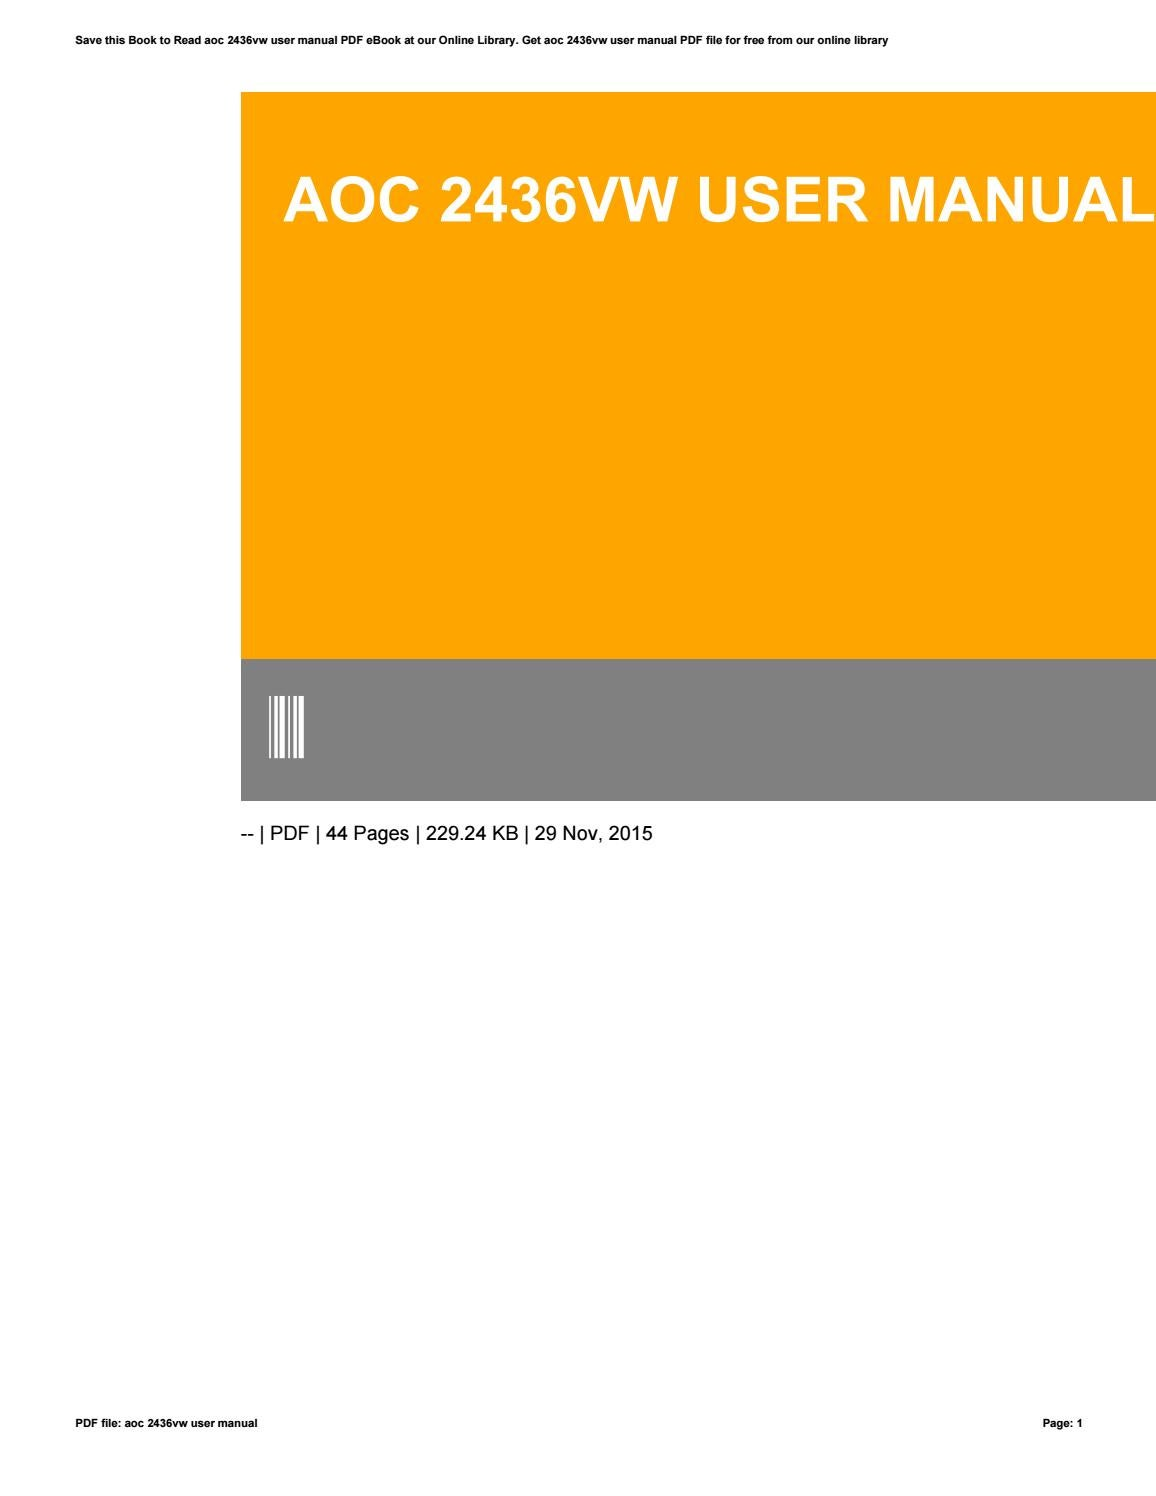 aoc 2436vw manual browse manual guides u2022 rh trufflefries co